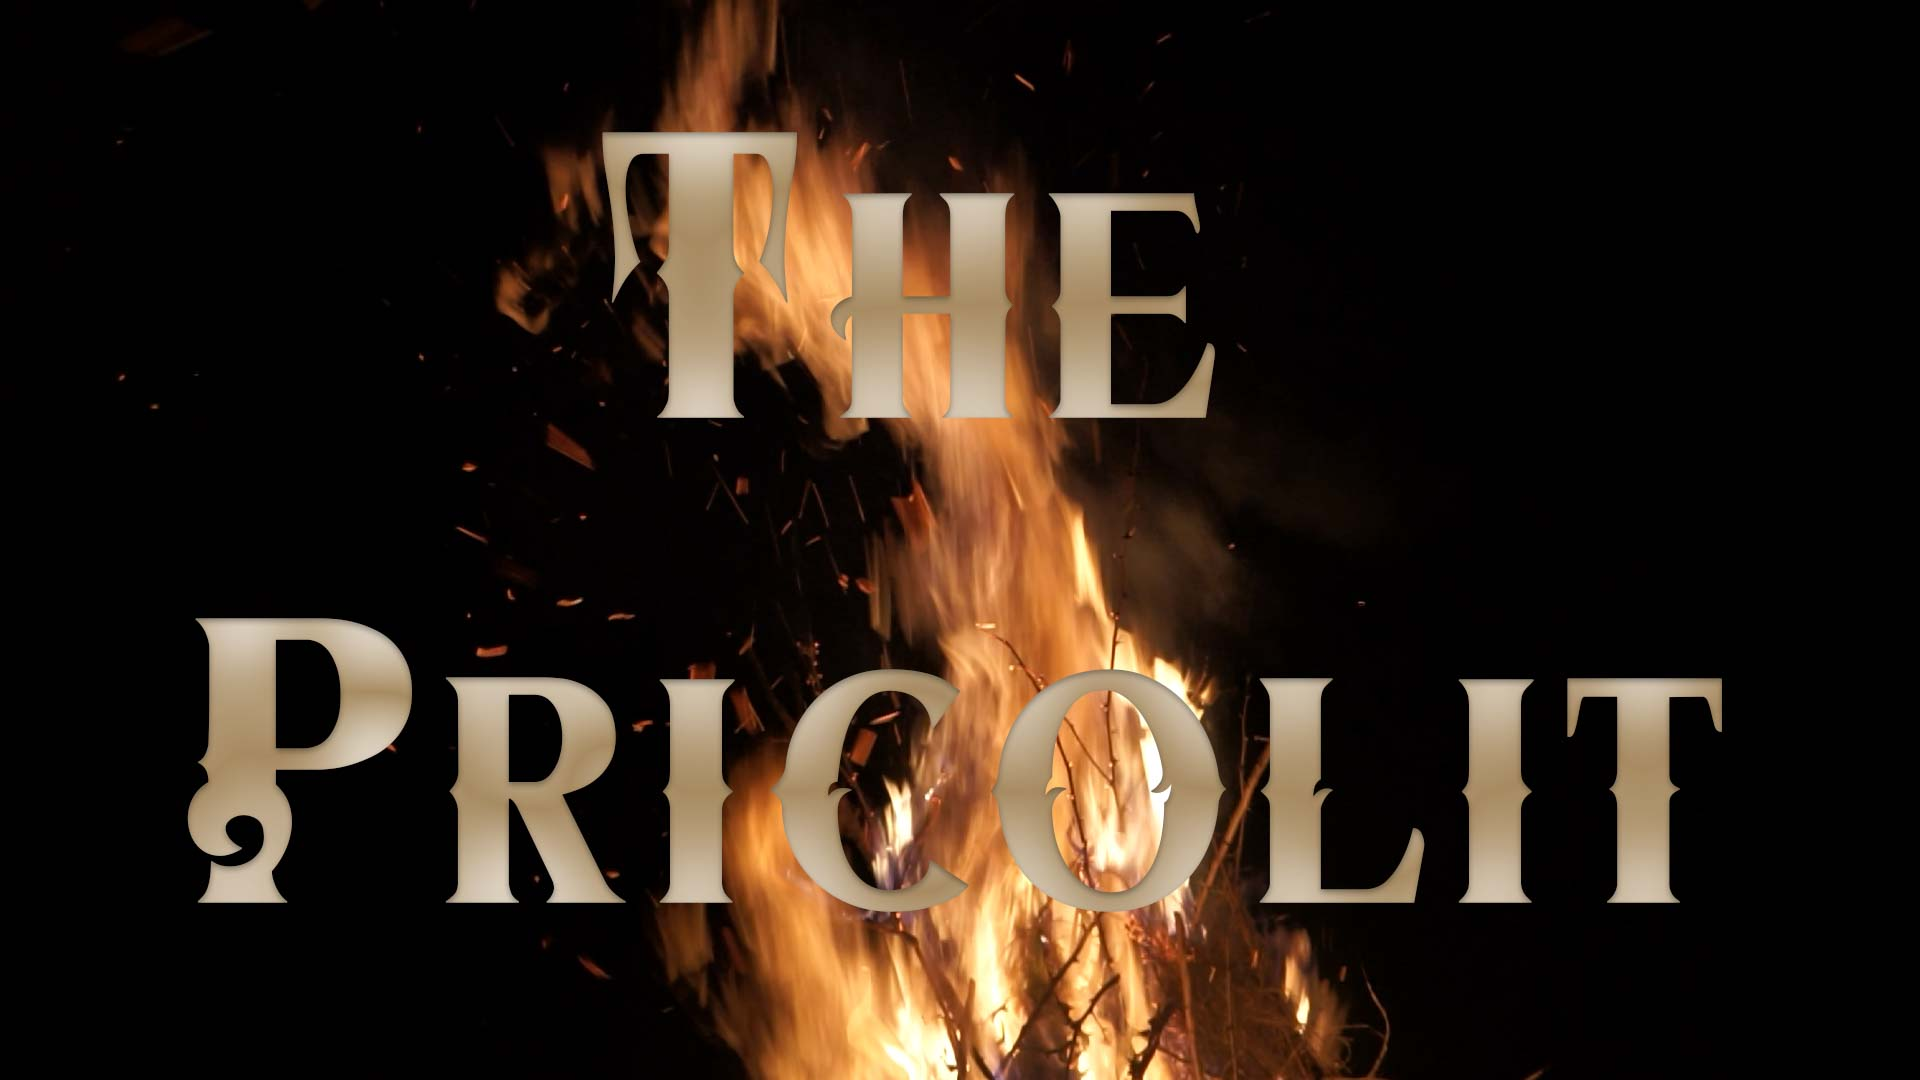 The Pricolit   MY RØDE REEL 2020 YOUNG FILMMAKER